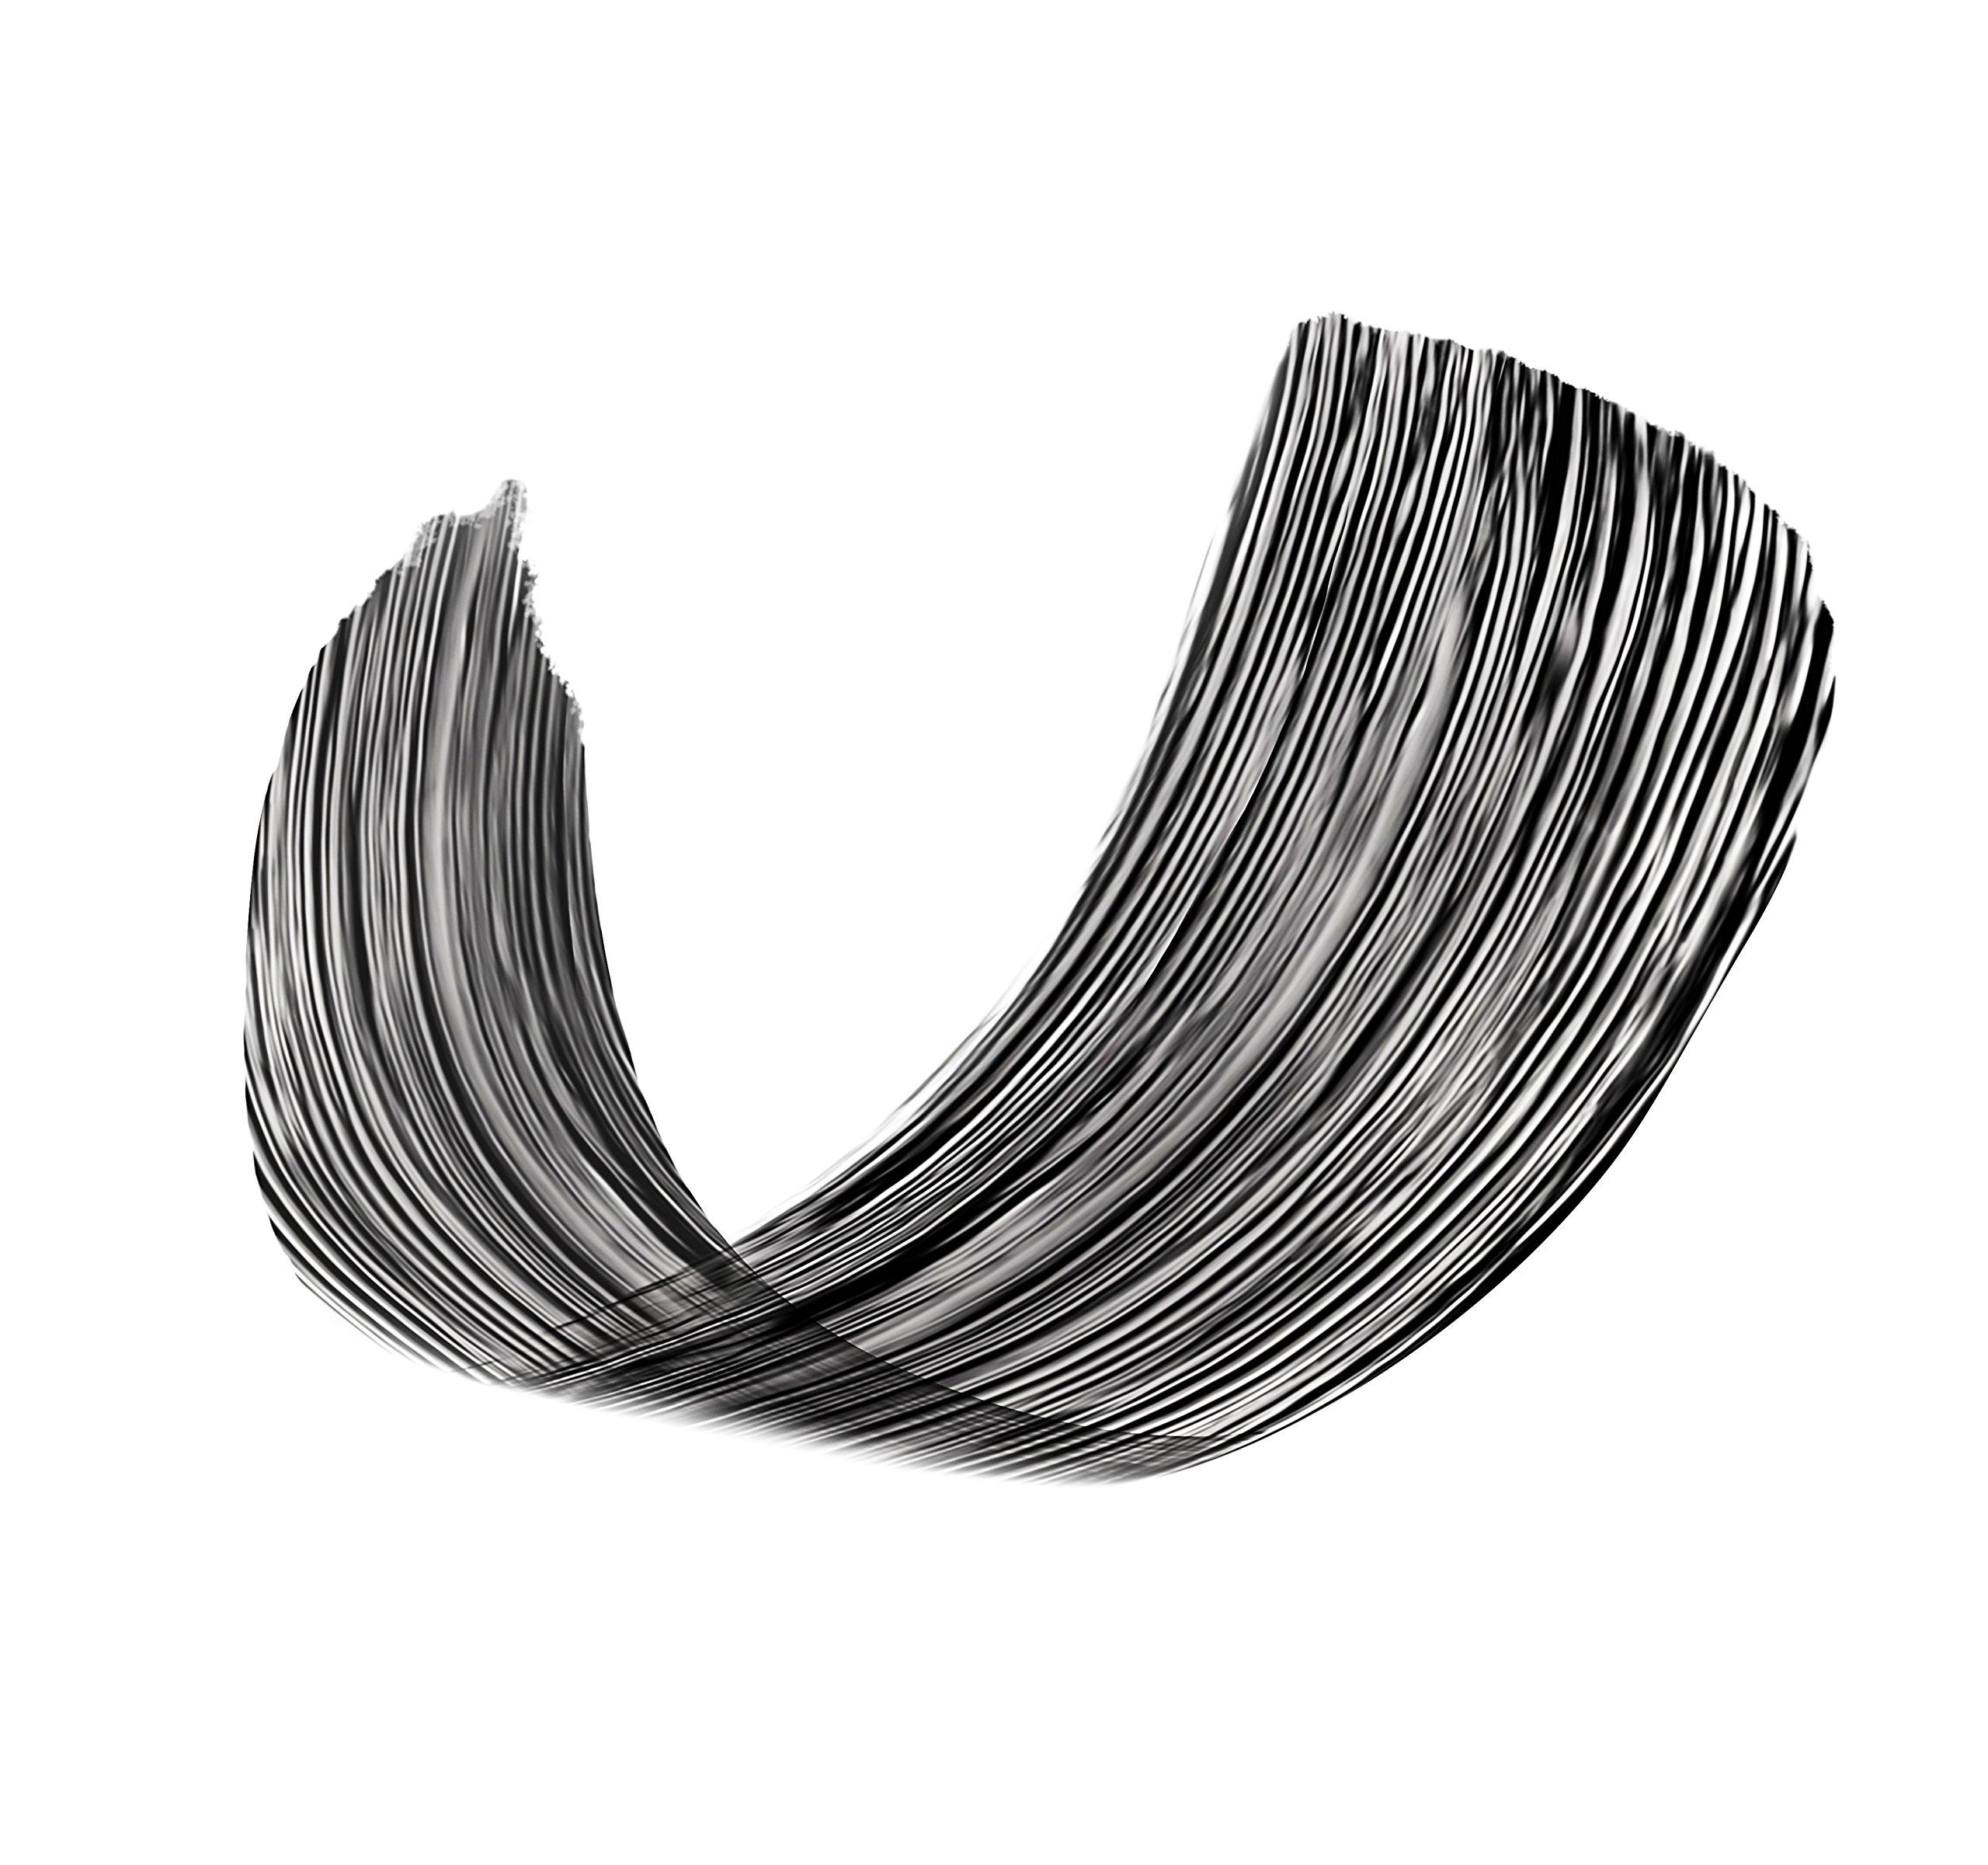 Rimmel London Colourist Mascara Color Negro - 11 ml